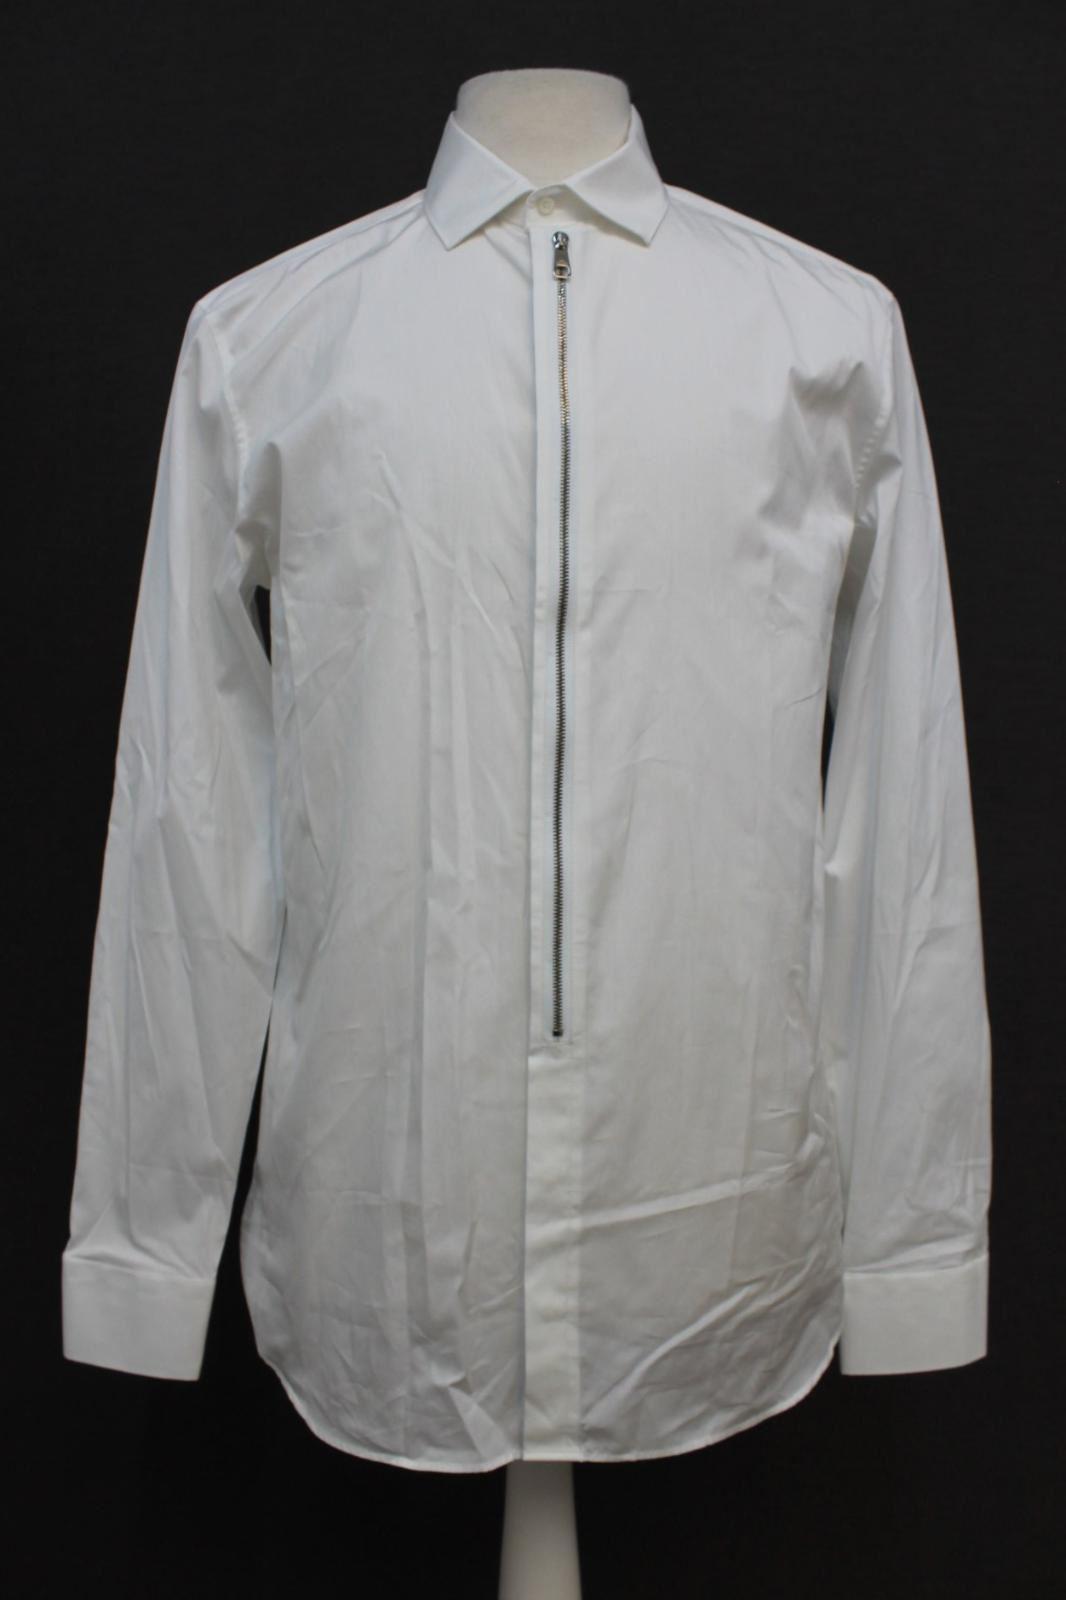 Neil-Barrett-para-hombre-calce-cenido-de-algodon-blanco-frontal-con-cremallera-con-cuello-camisa